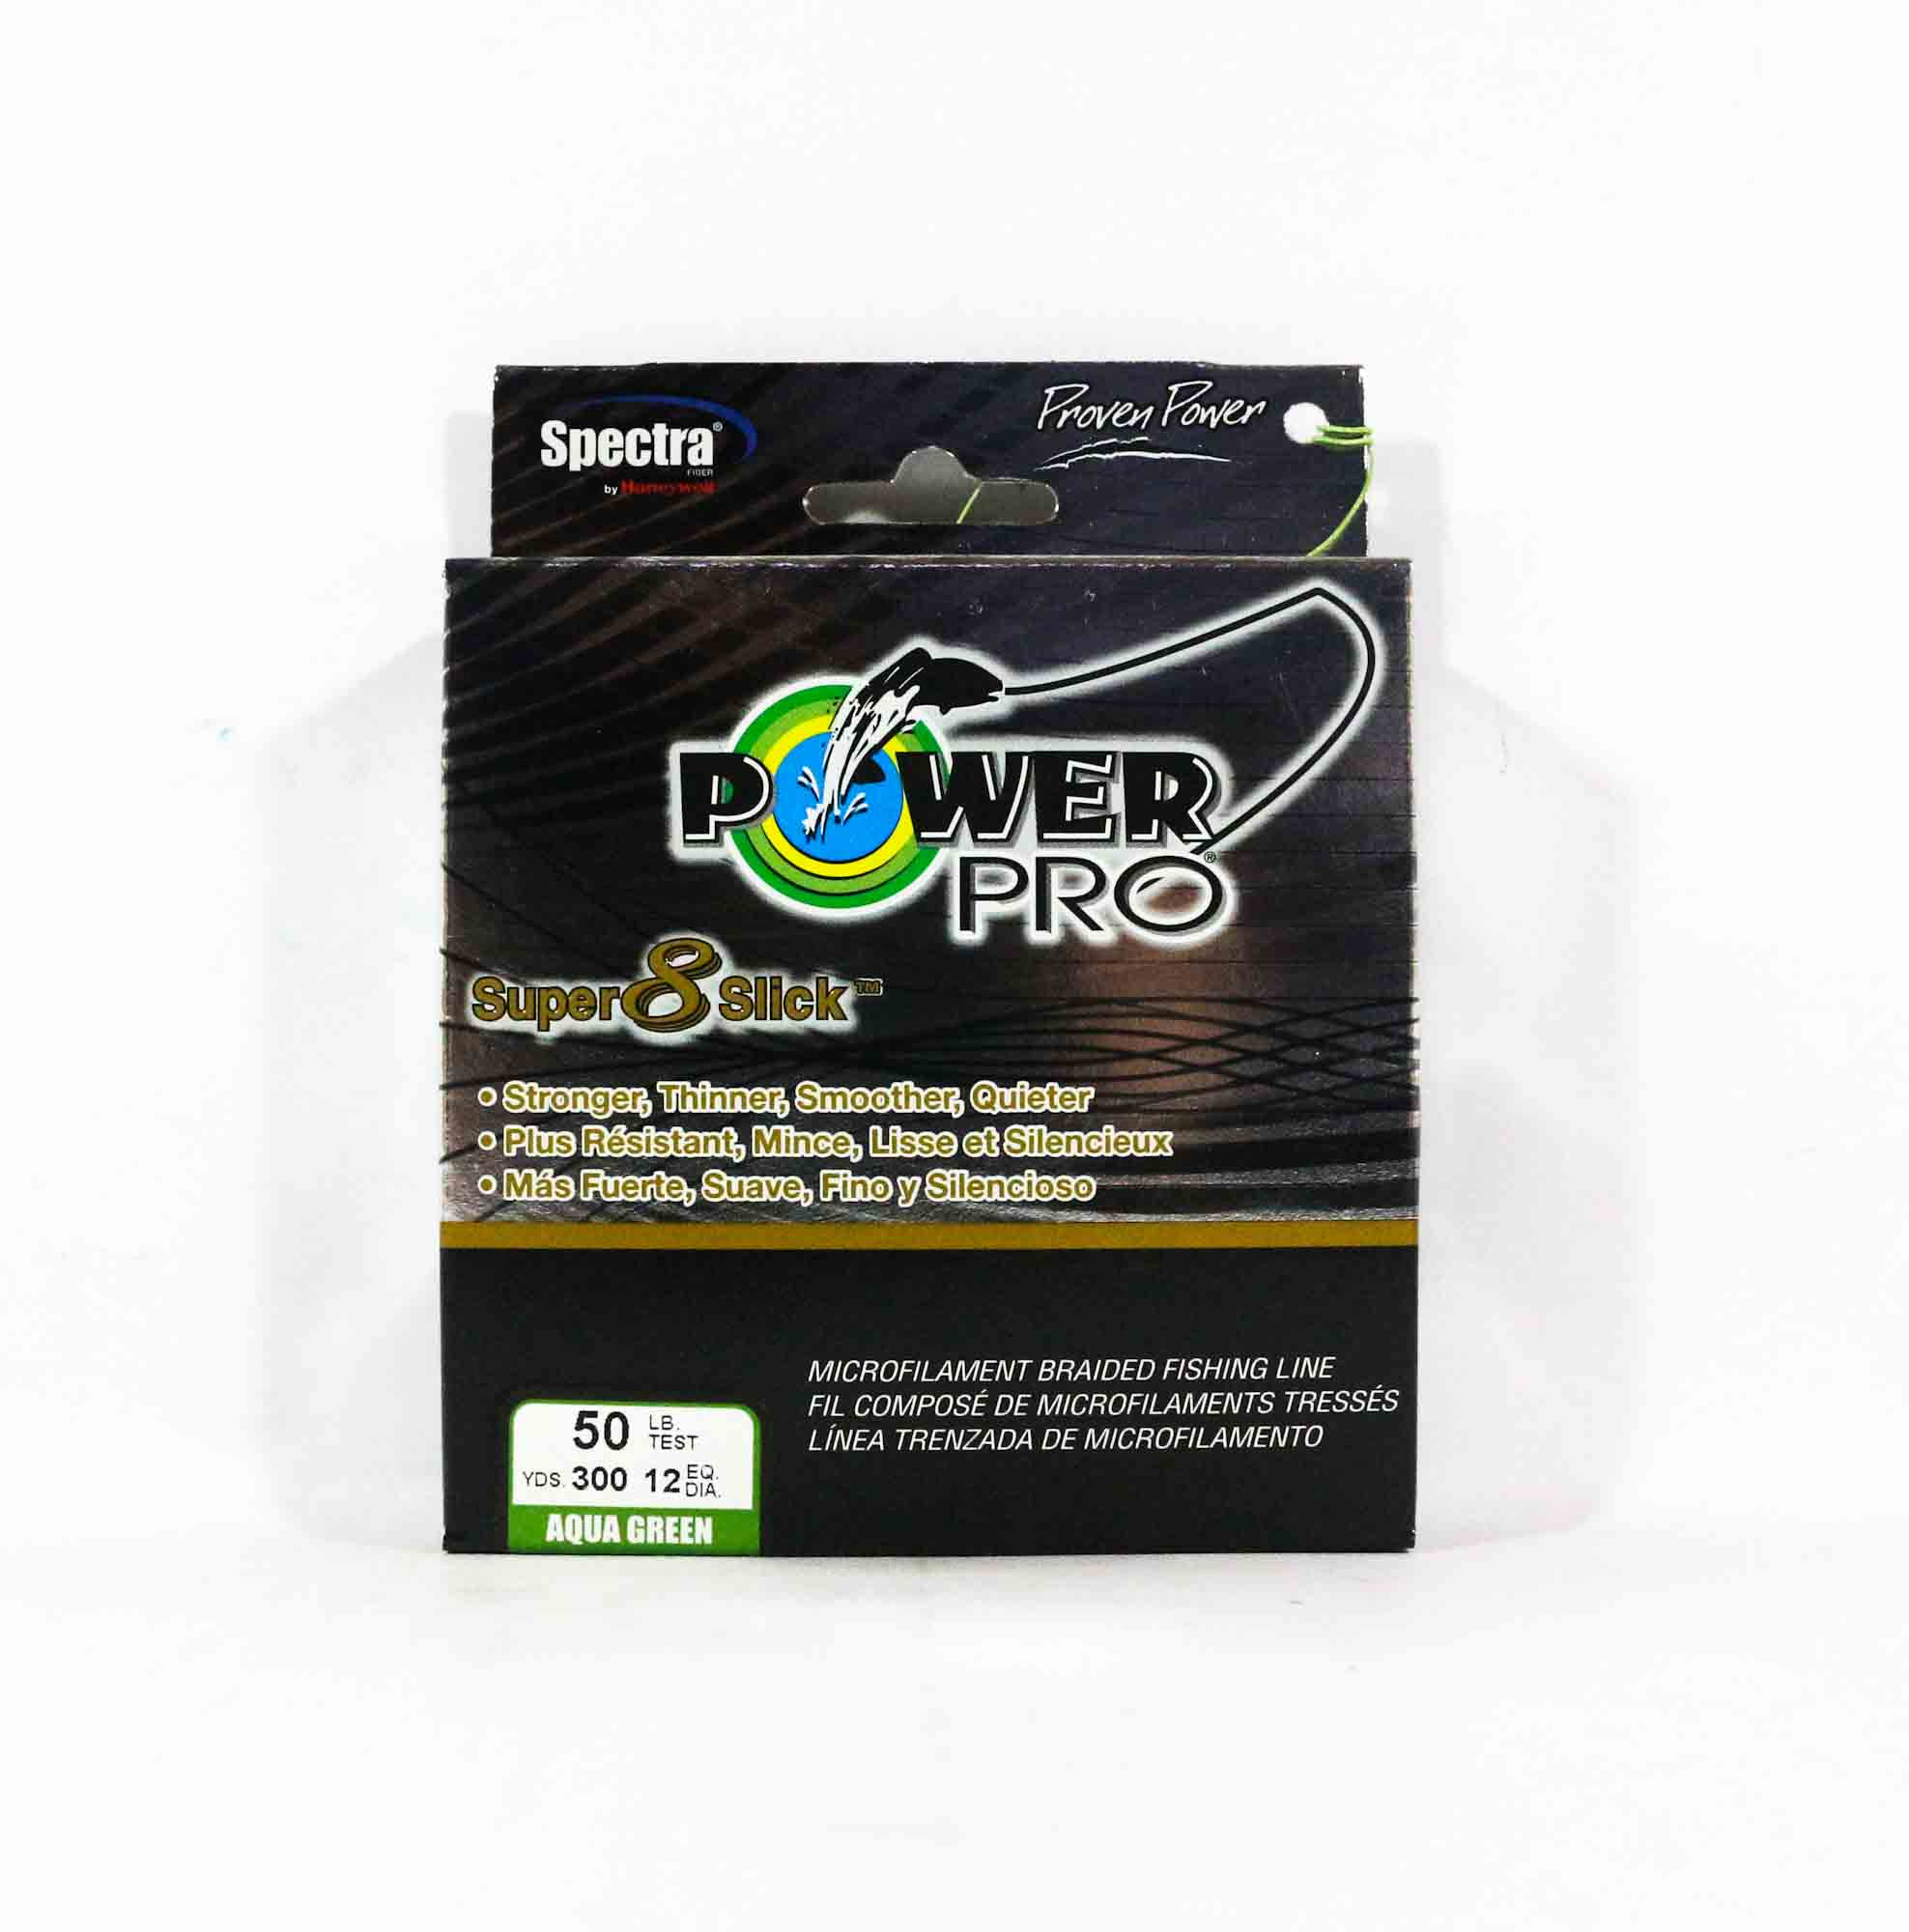 Power Pro Super 8 Slick Spectra Line 50lb by 300yds Green (0749)